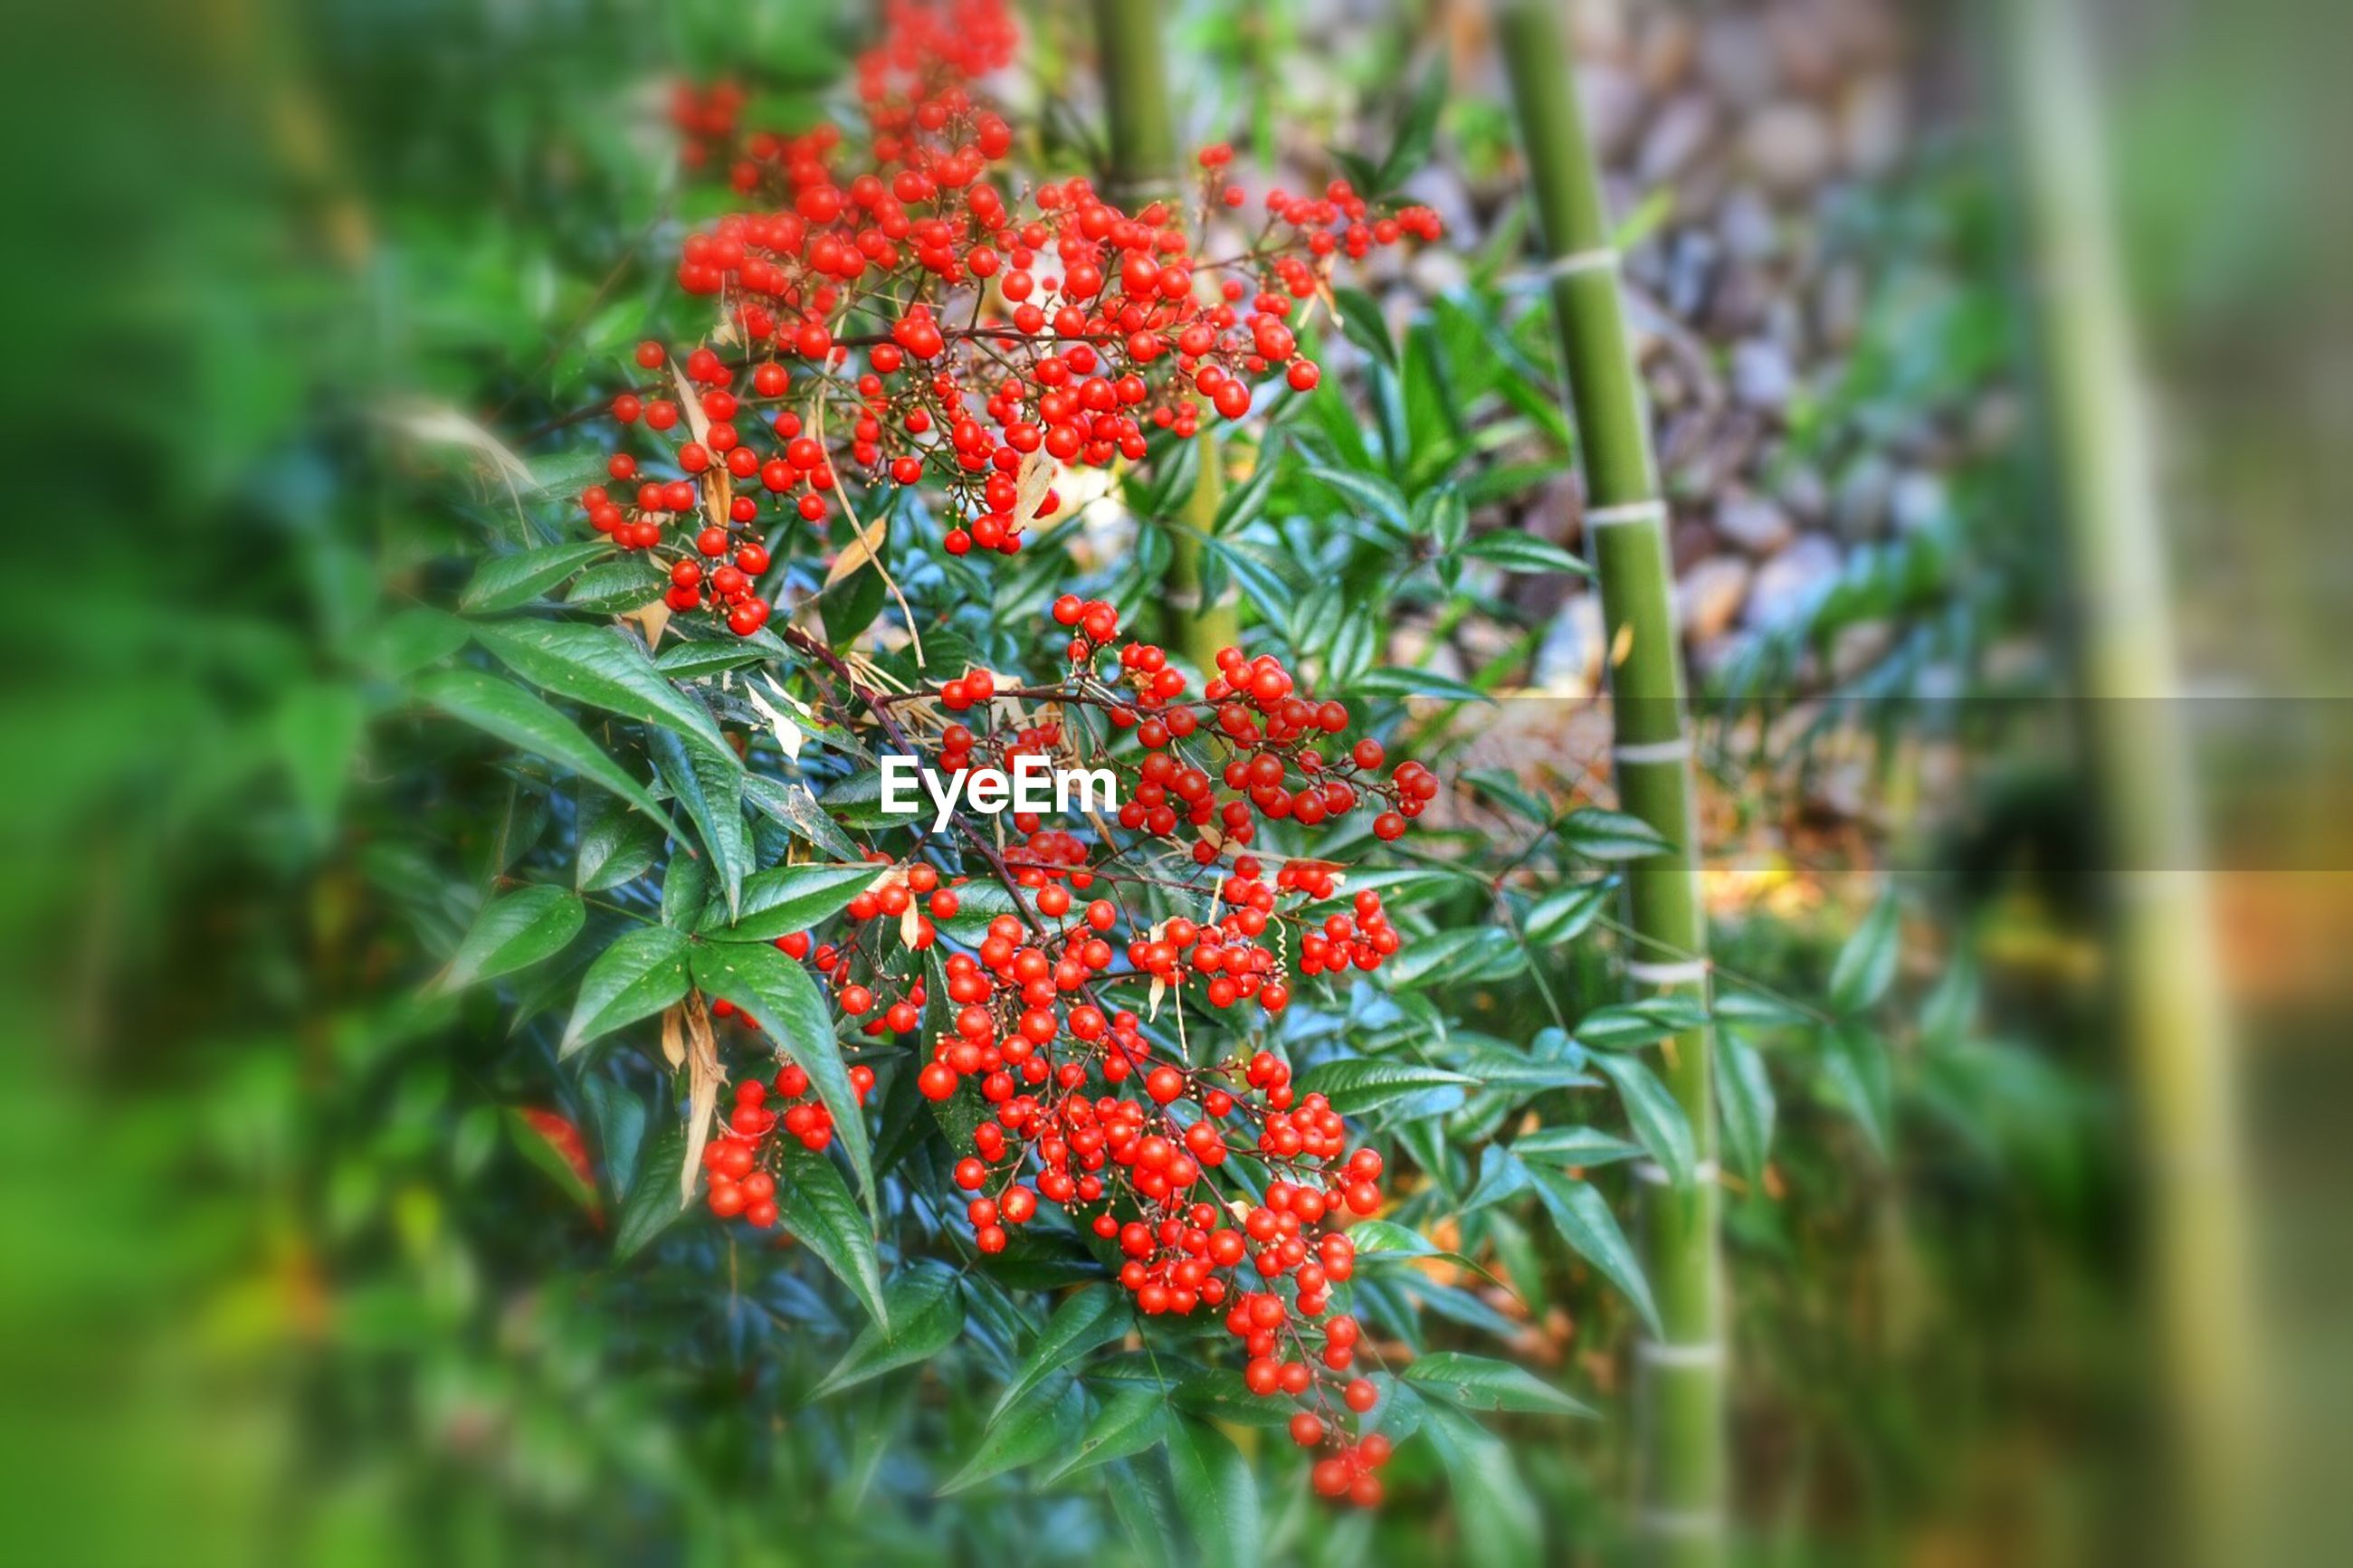 Red cherries on tree